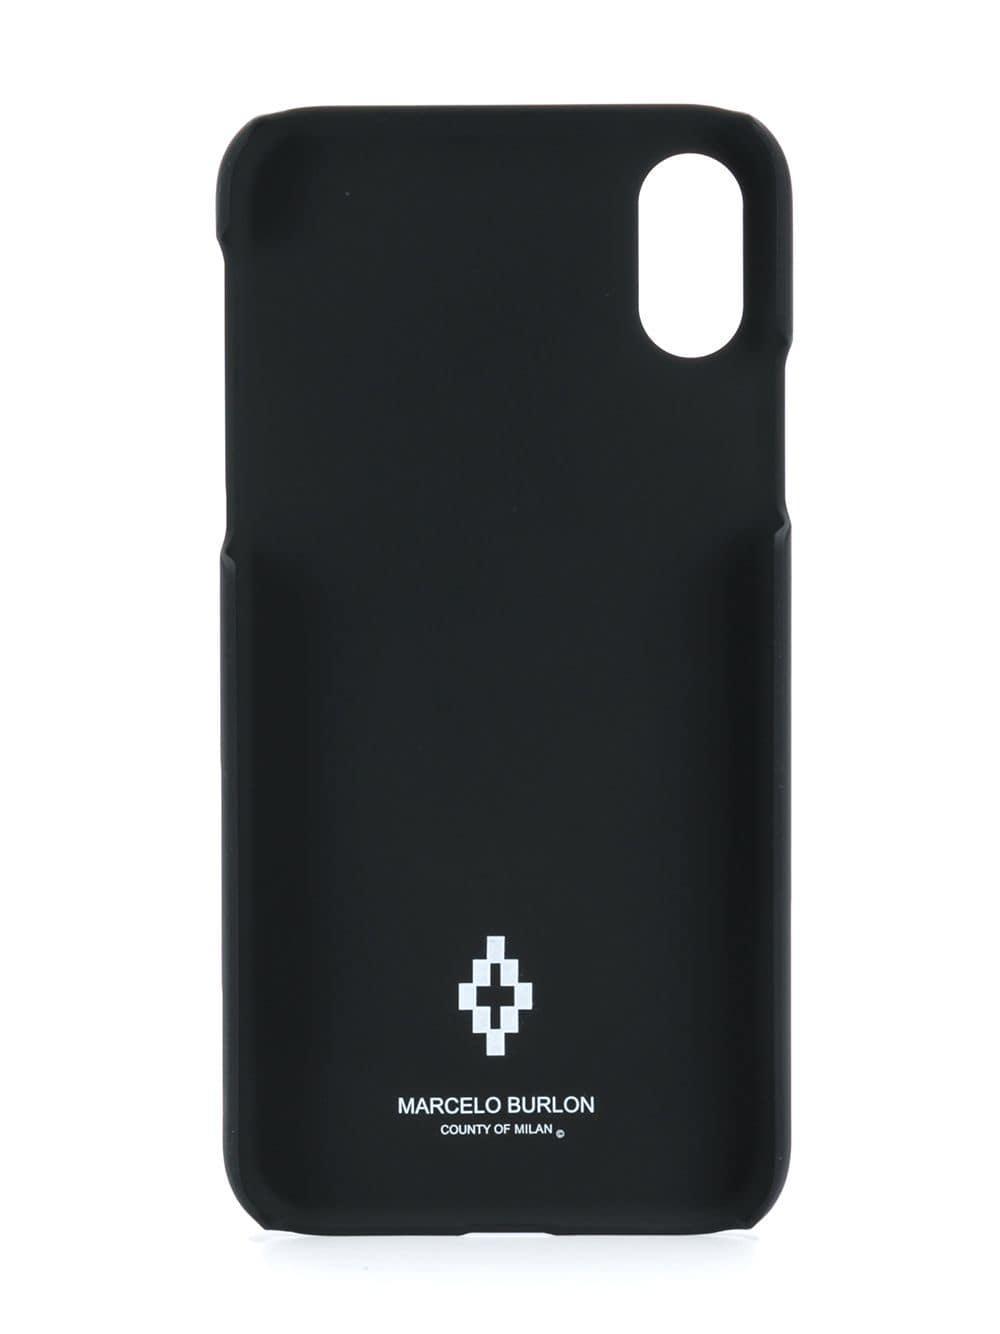 38fa59a69ef1 Lyst - Marcelo Burlon Floppy Disk Iphone X Case in Black for Men